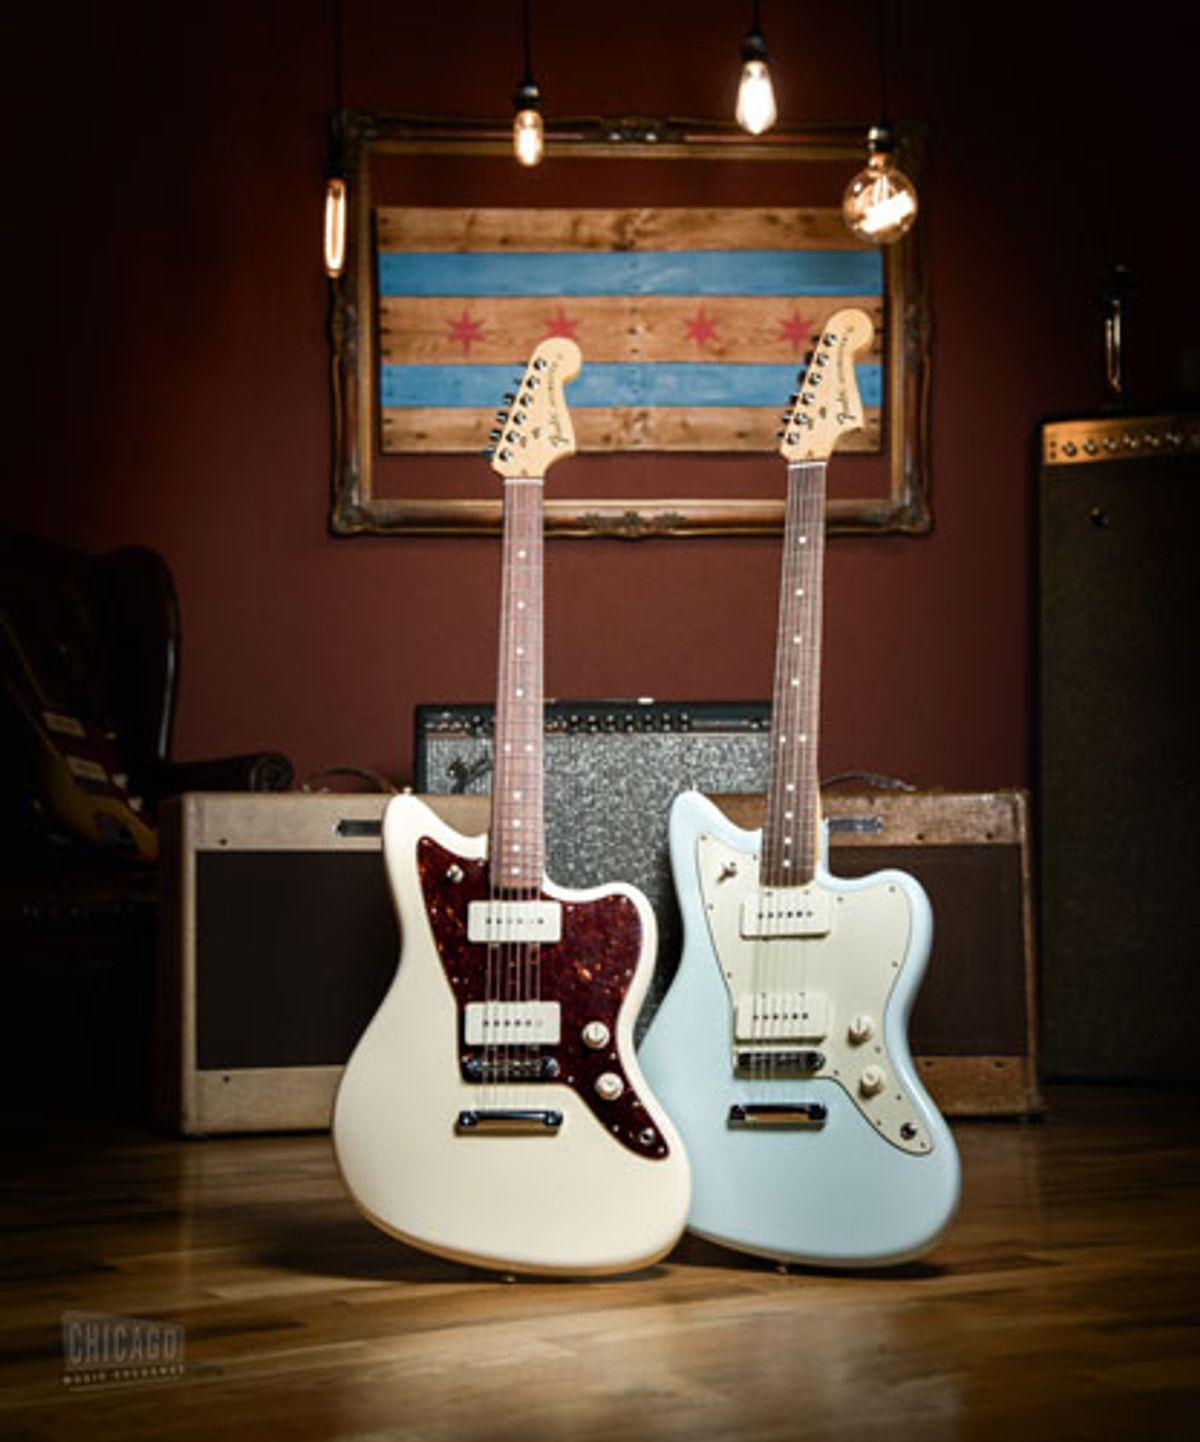 Chicago Music Exchange Launches Exclusive Fender Jazzmaster